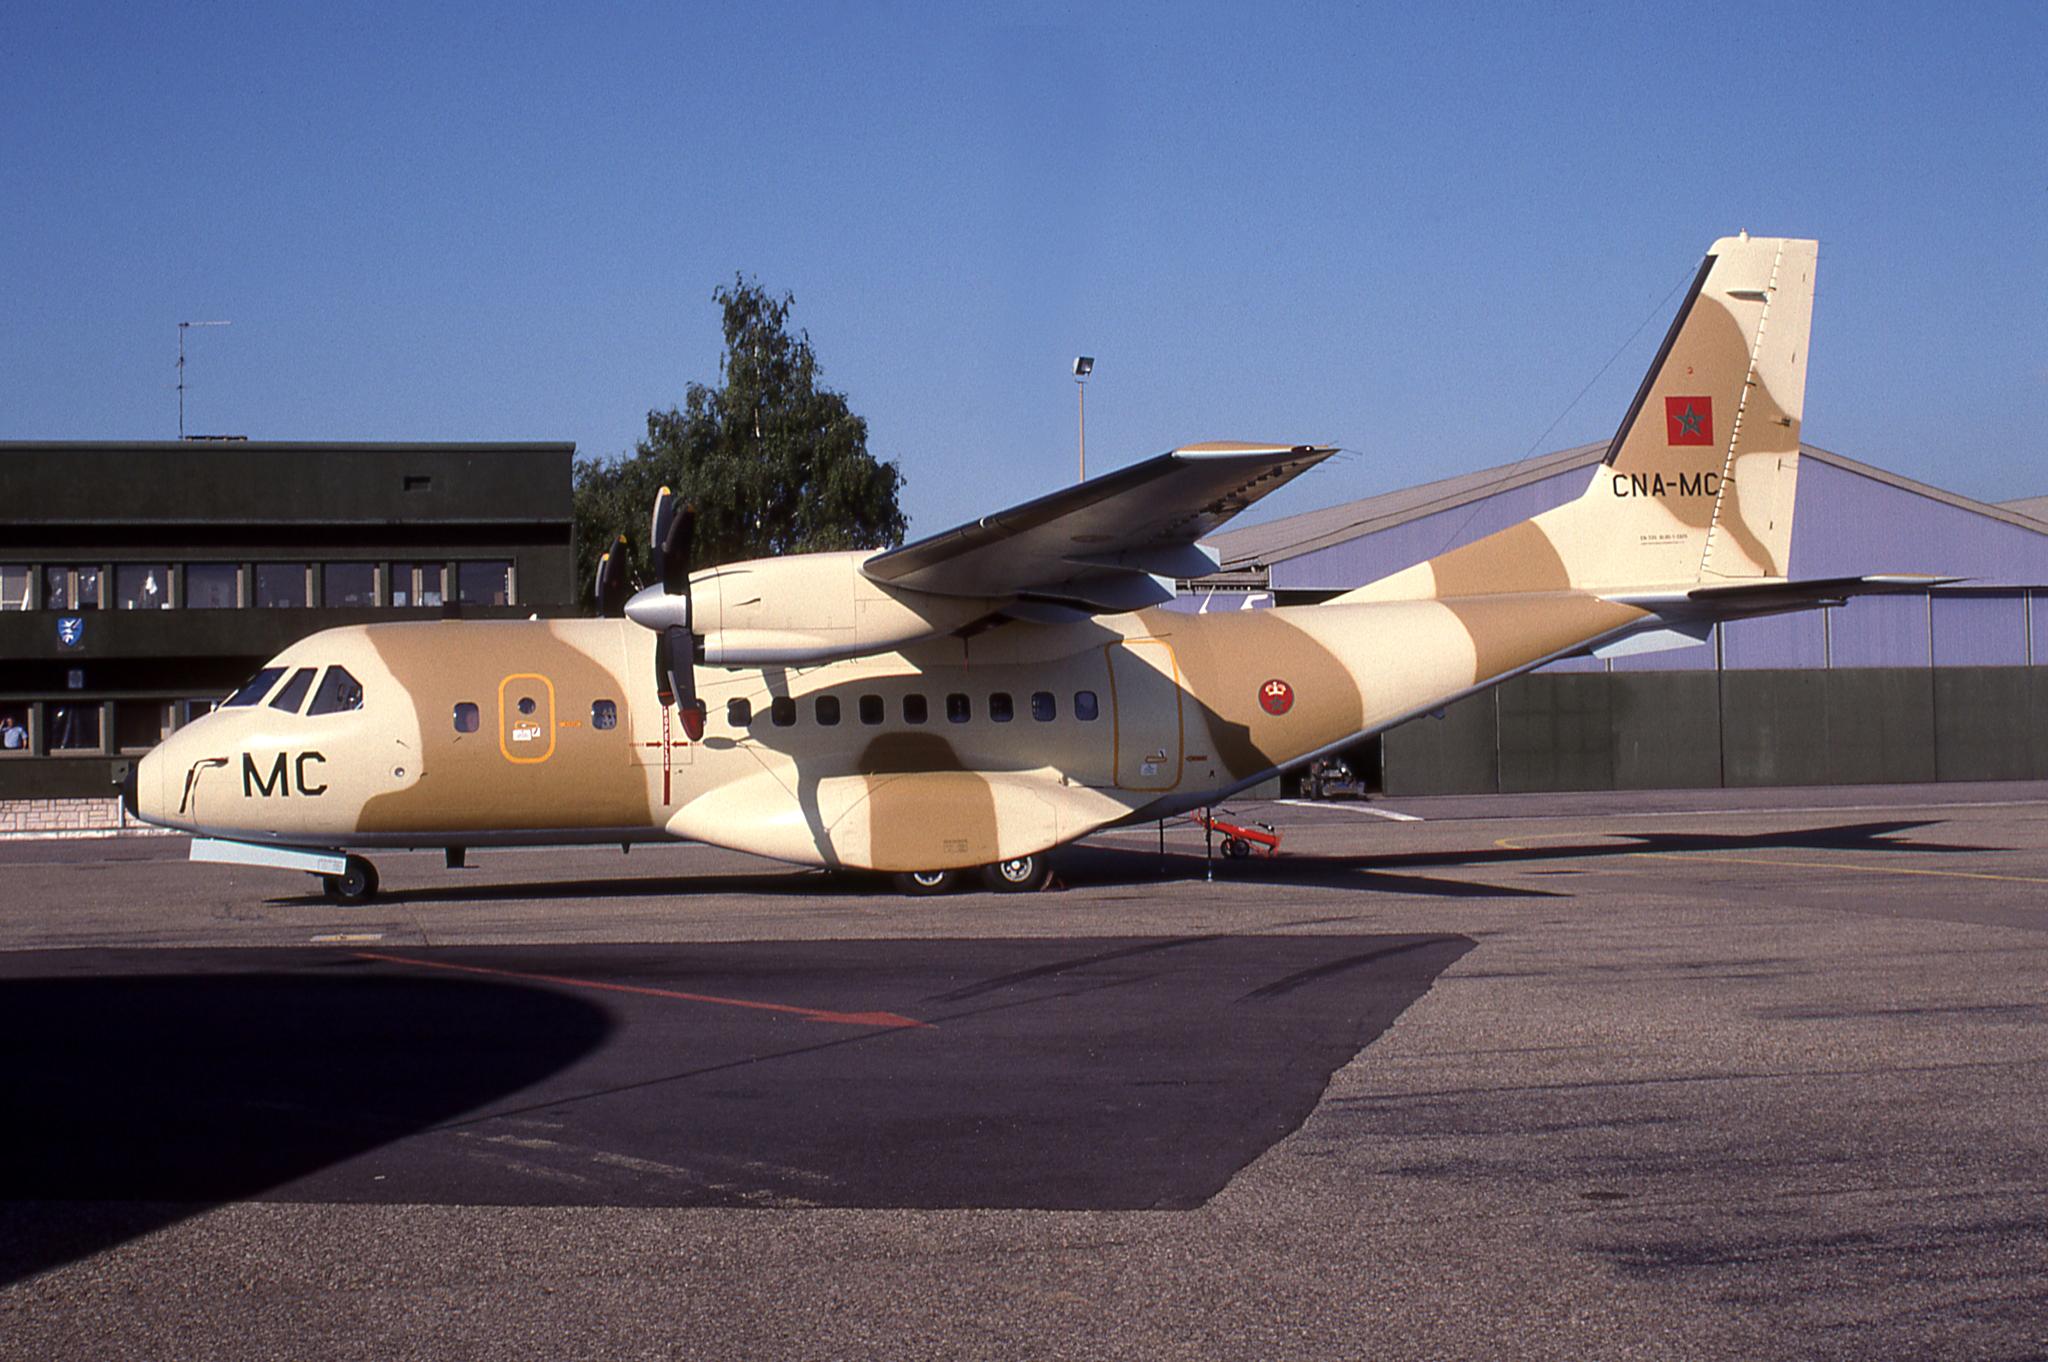 FRA: Photos d'avions de transport - Page 38 47814409791_98a78216c7_o